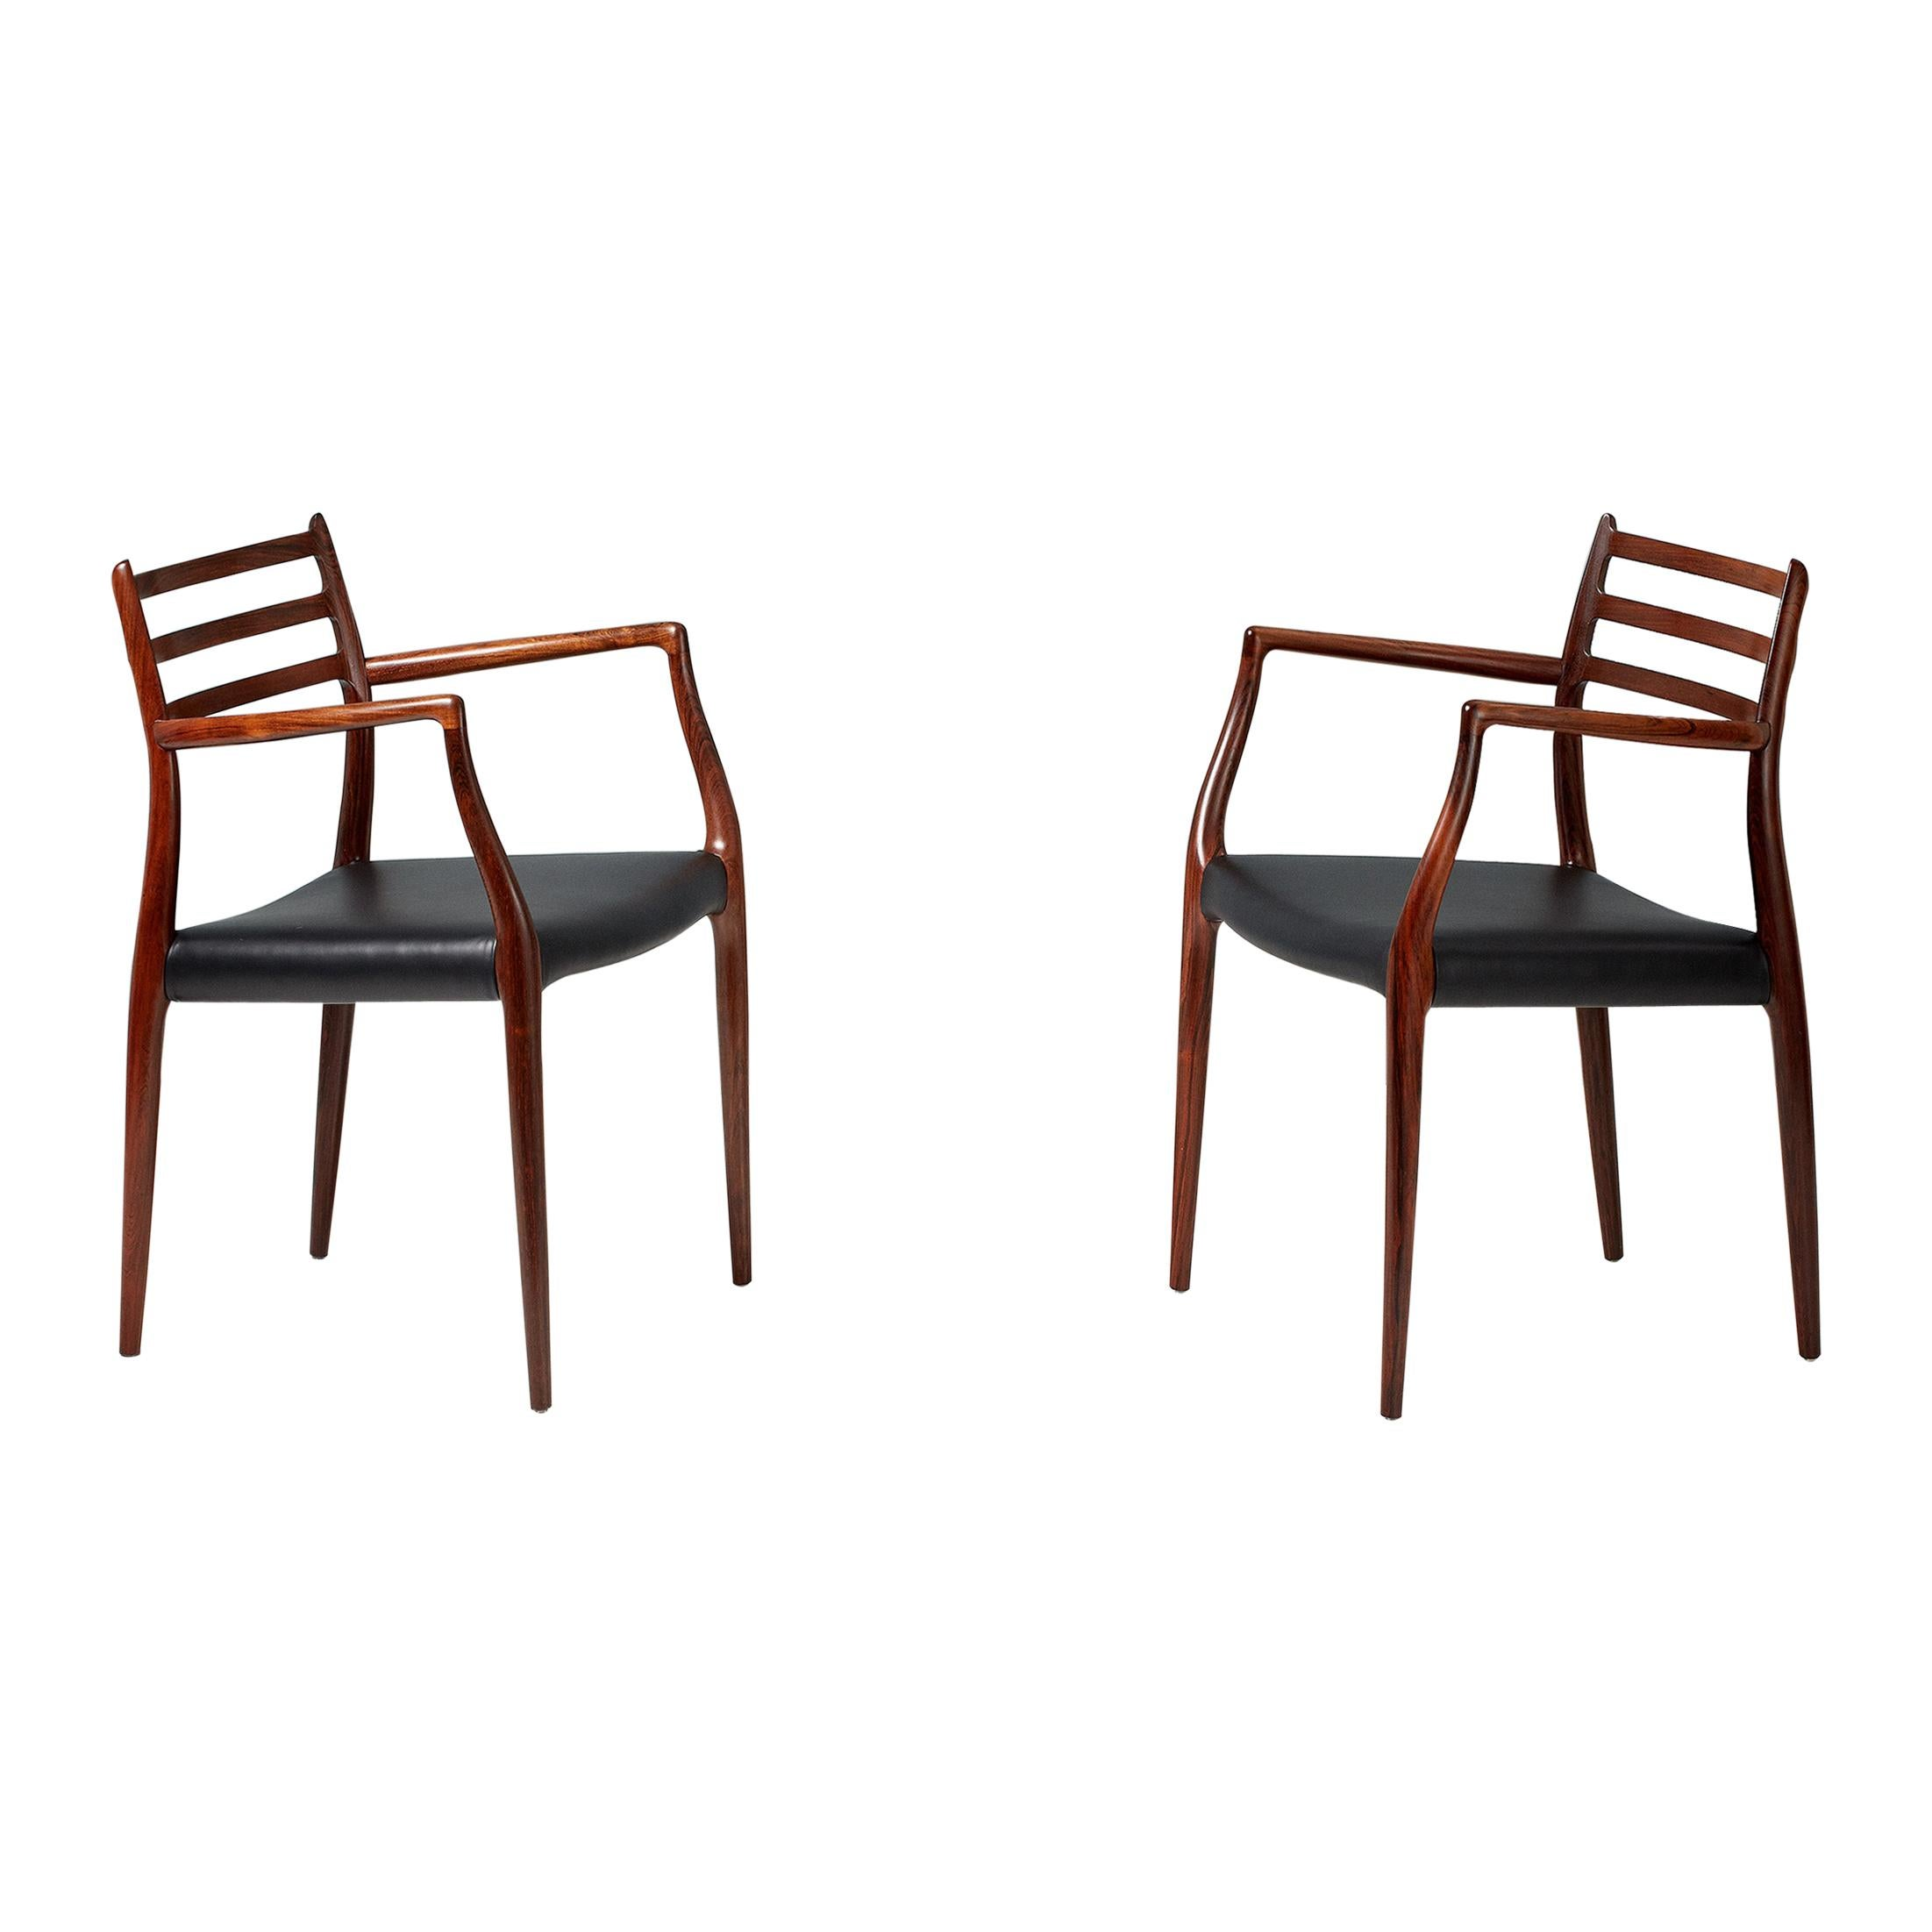 Model 62 Chair